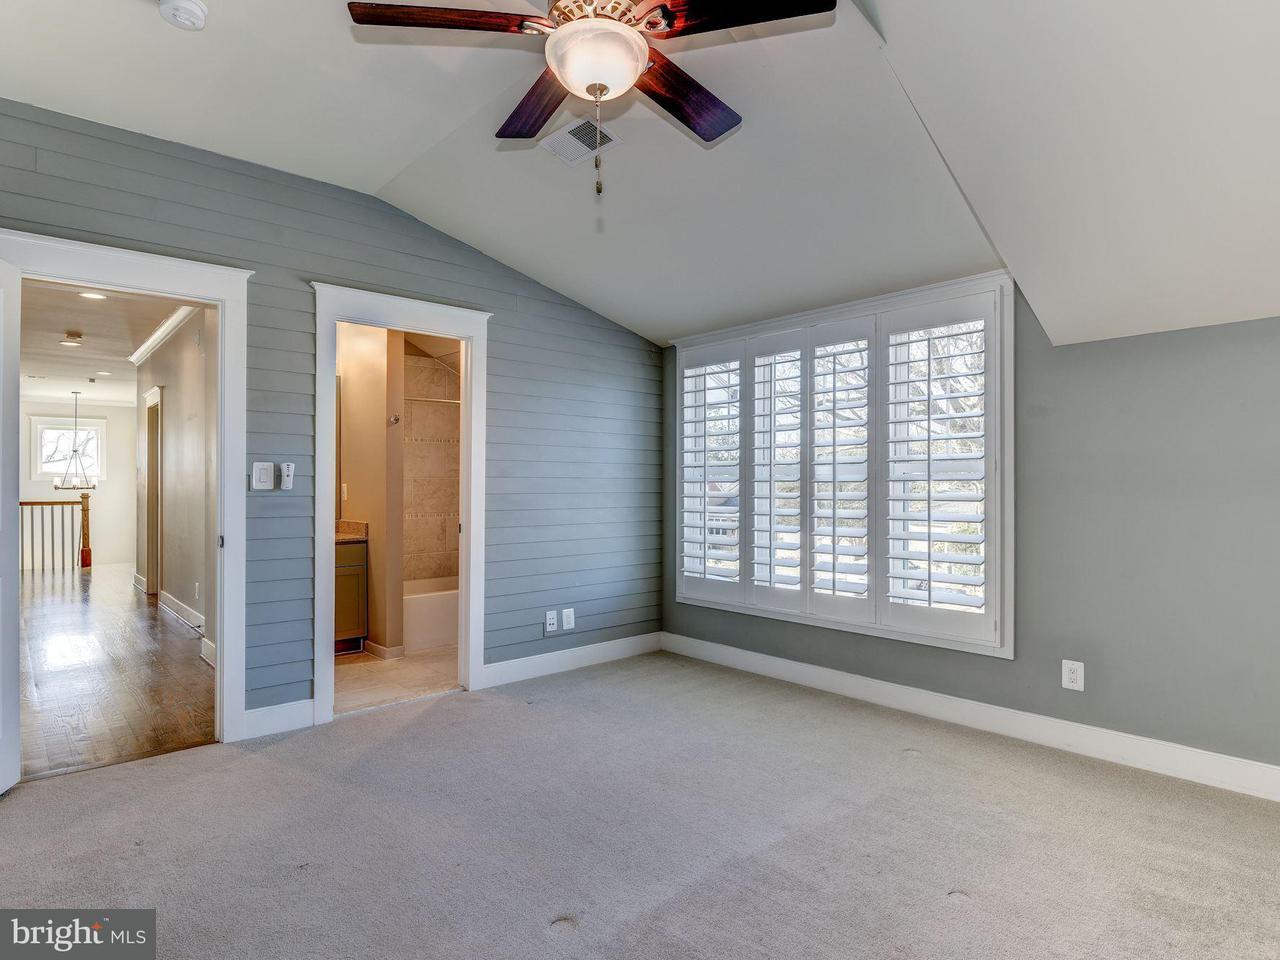 Additional photo for property listing at 401 Meadow Lane 401 Meadow Lane Falls Church, Virginia 22042 Stati Uniti